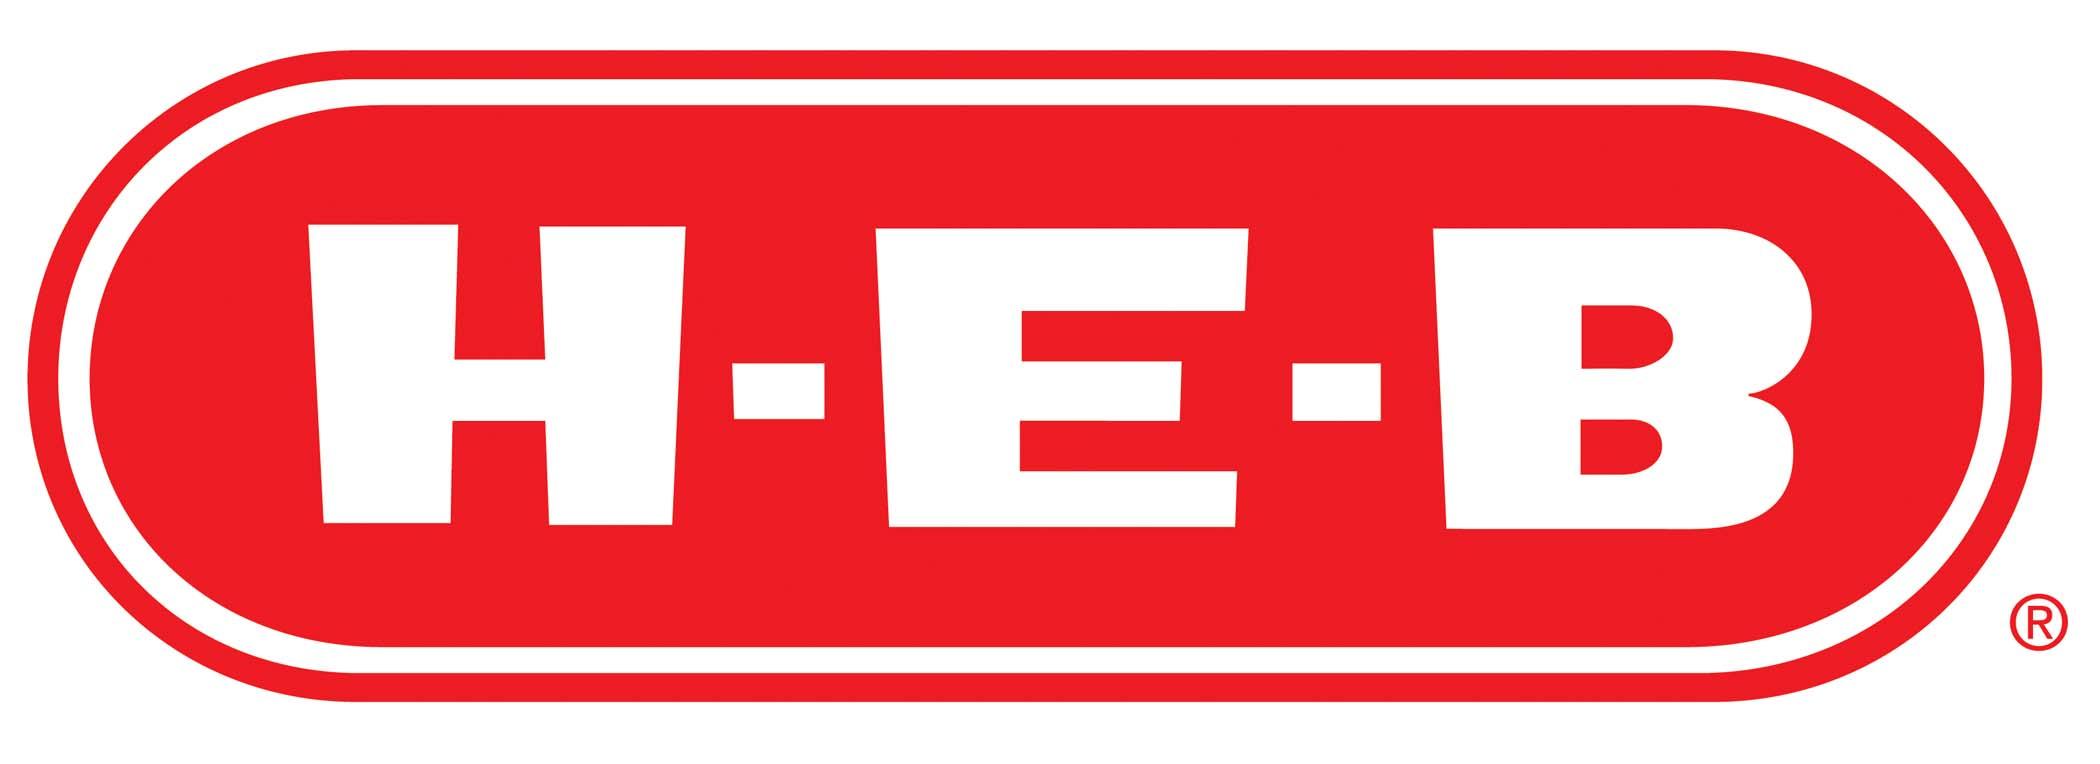 H-E-B-RED-logo.jpg